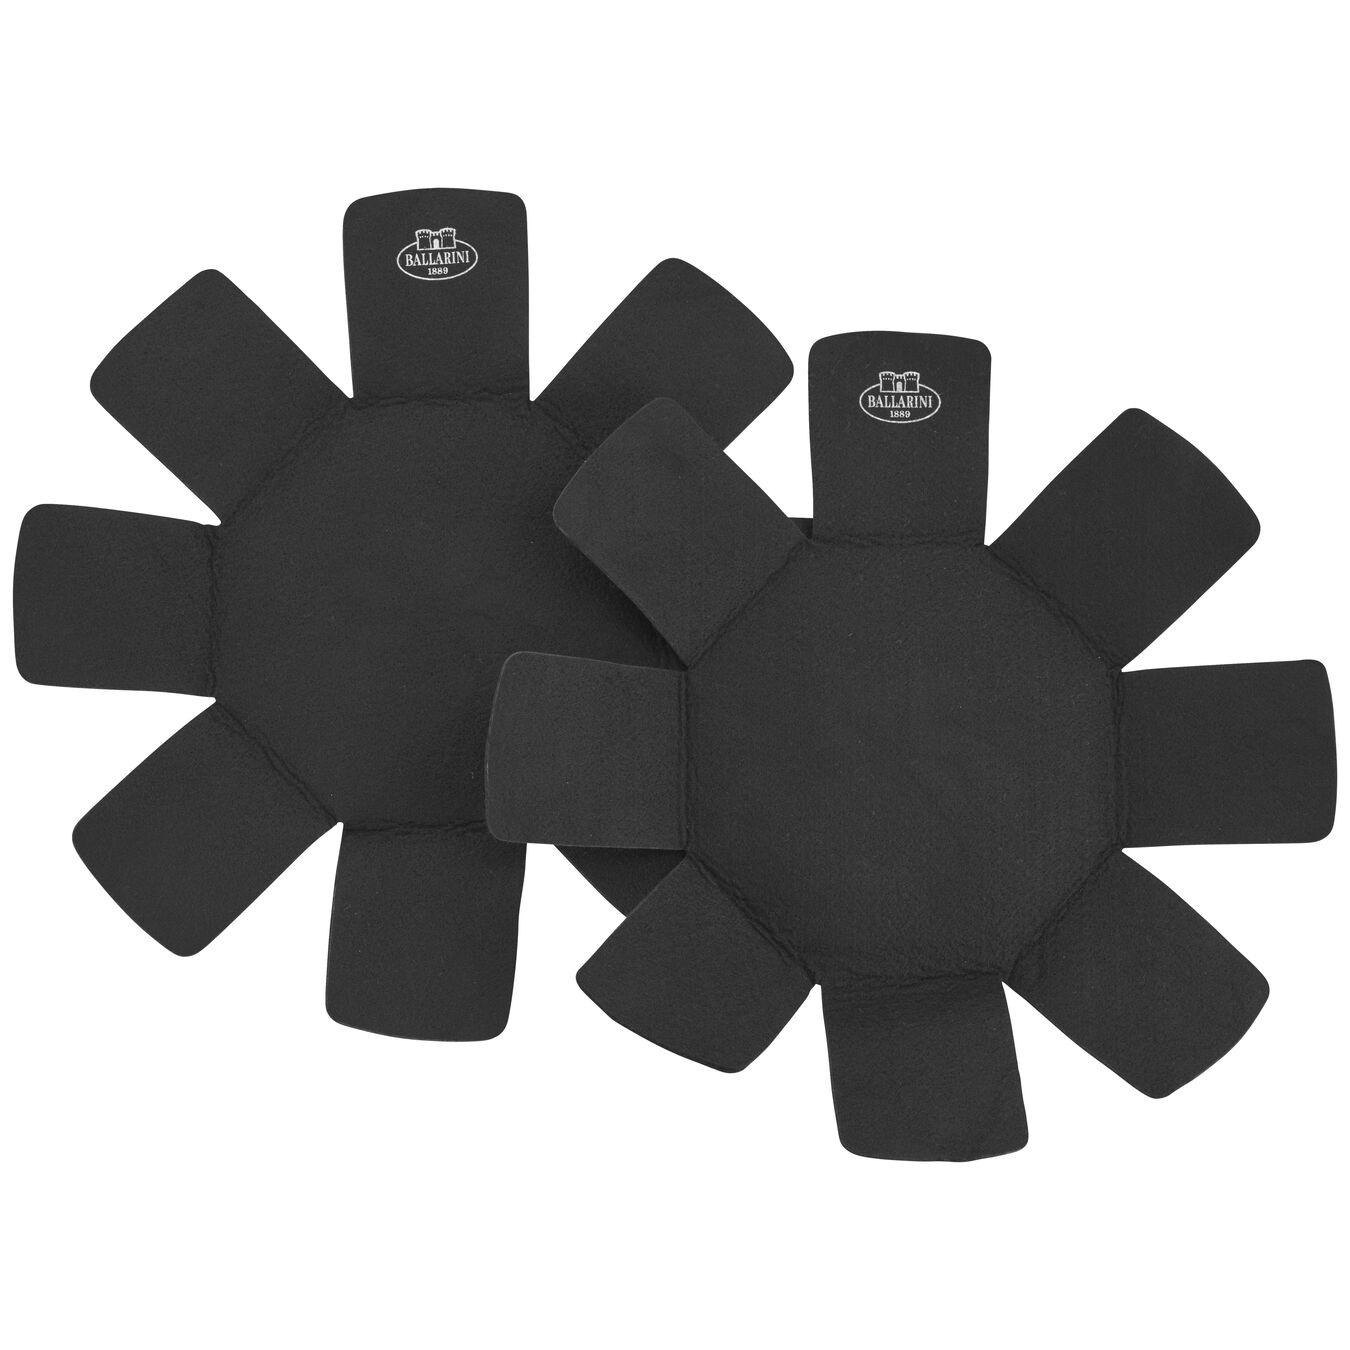 2-pc 16.5-inch Felt Cookware Protectors,,large 2